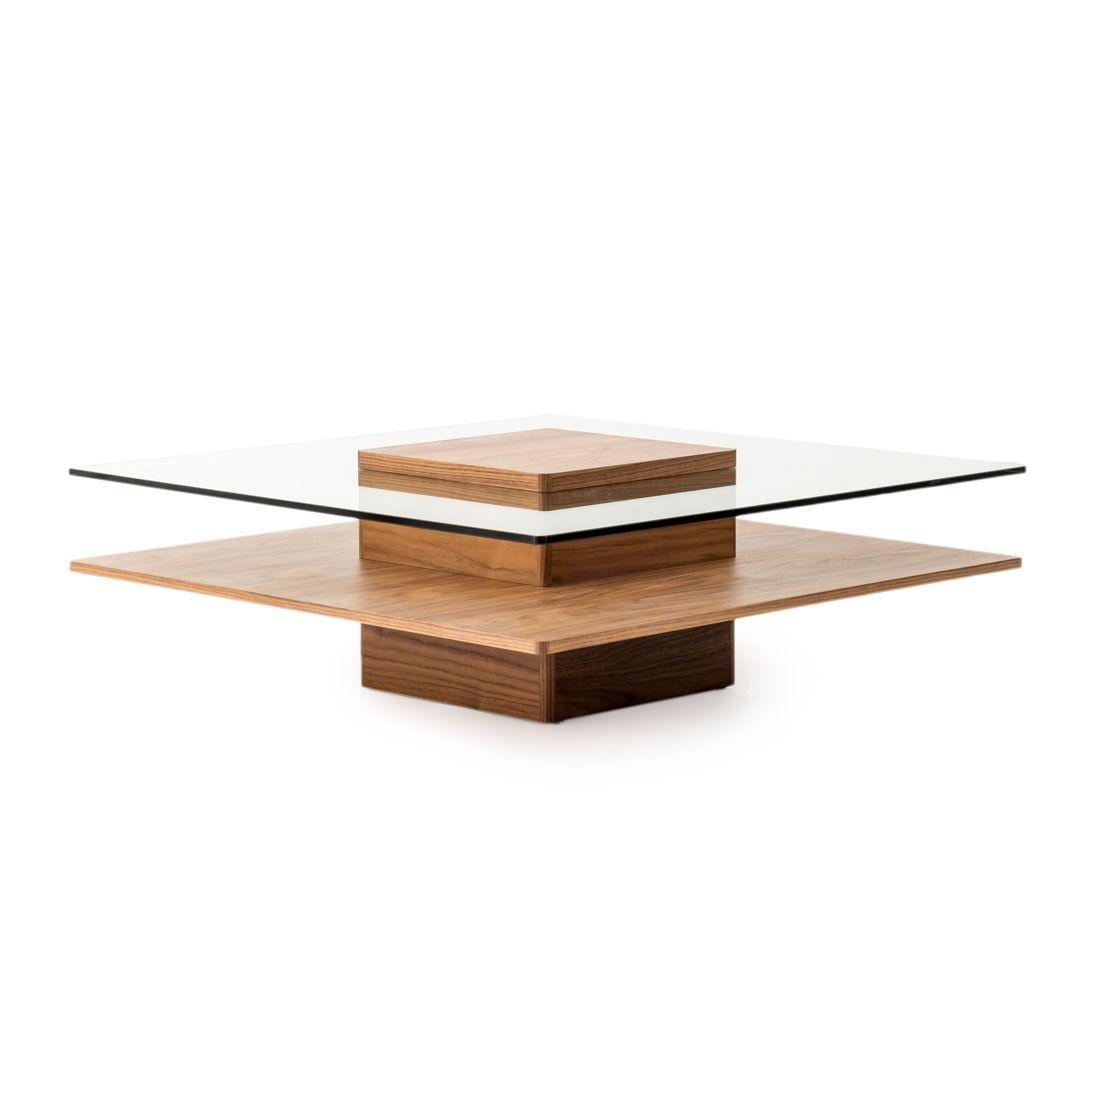 Square Coffee Table Piatto By Mobilia Tempered Glass Top